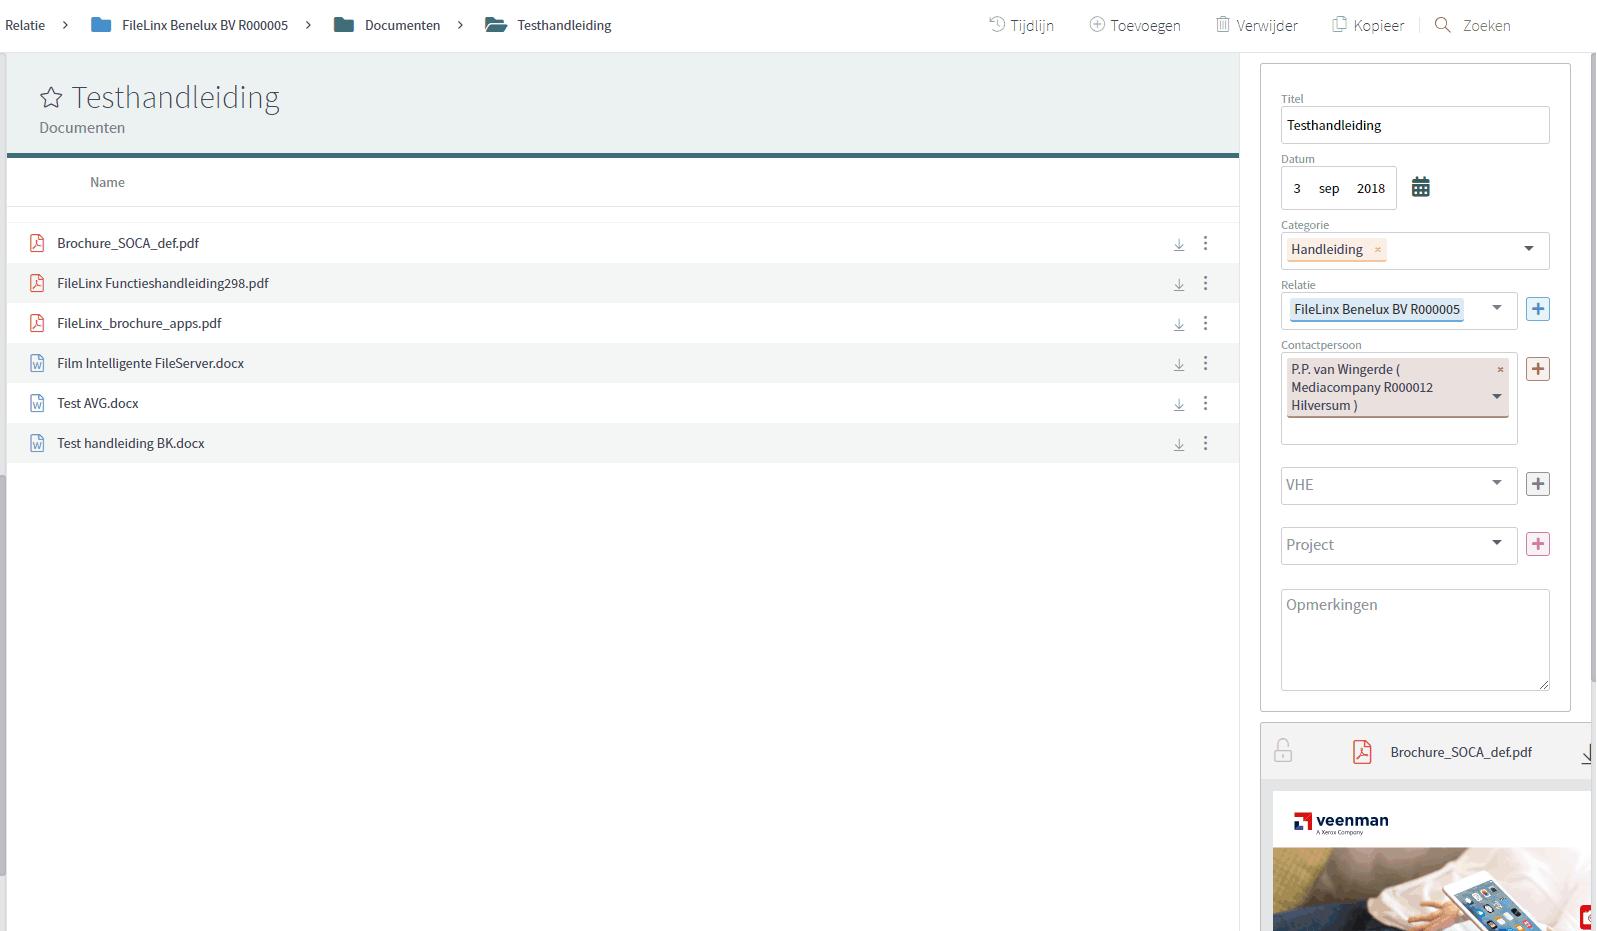 Directoryview